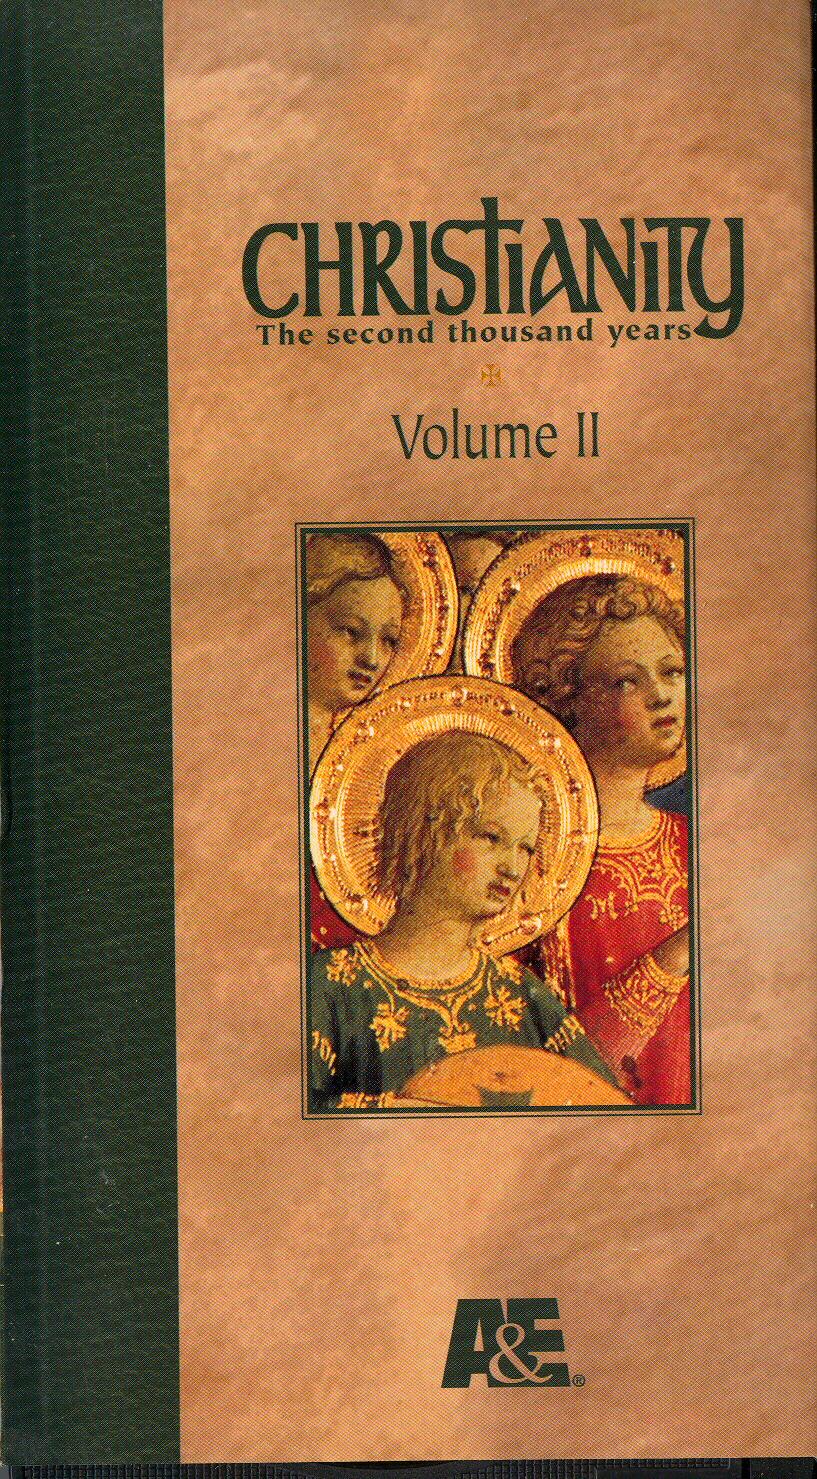 Christianity-Vol2.jpg